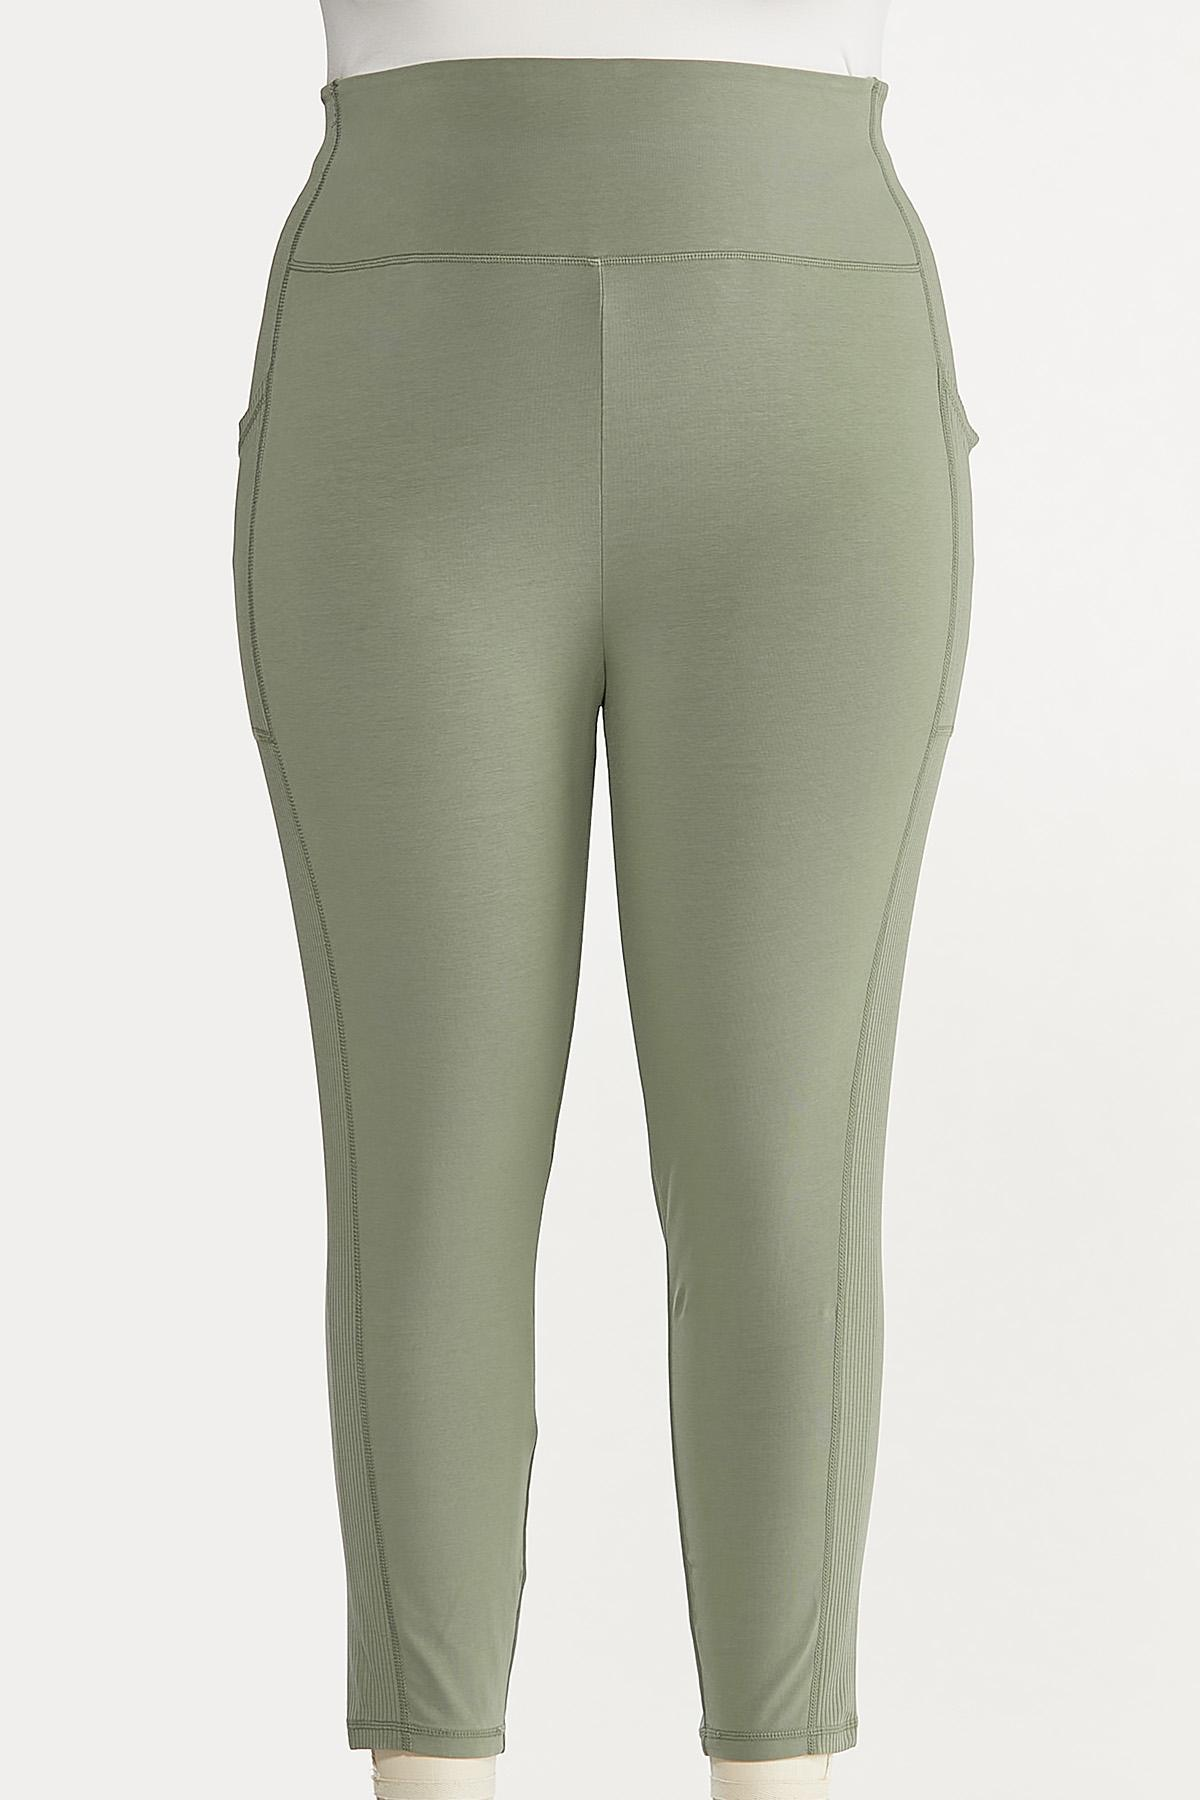 Plus Size Cropped Side Pocket Leggings